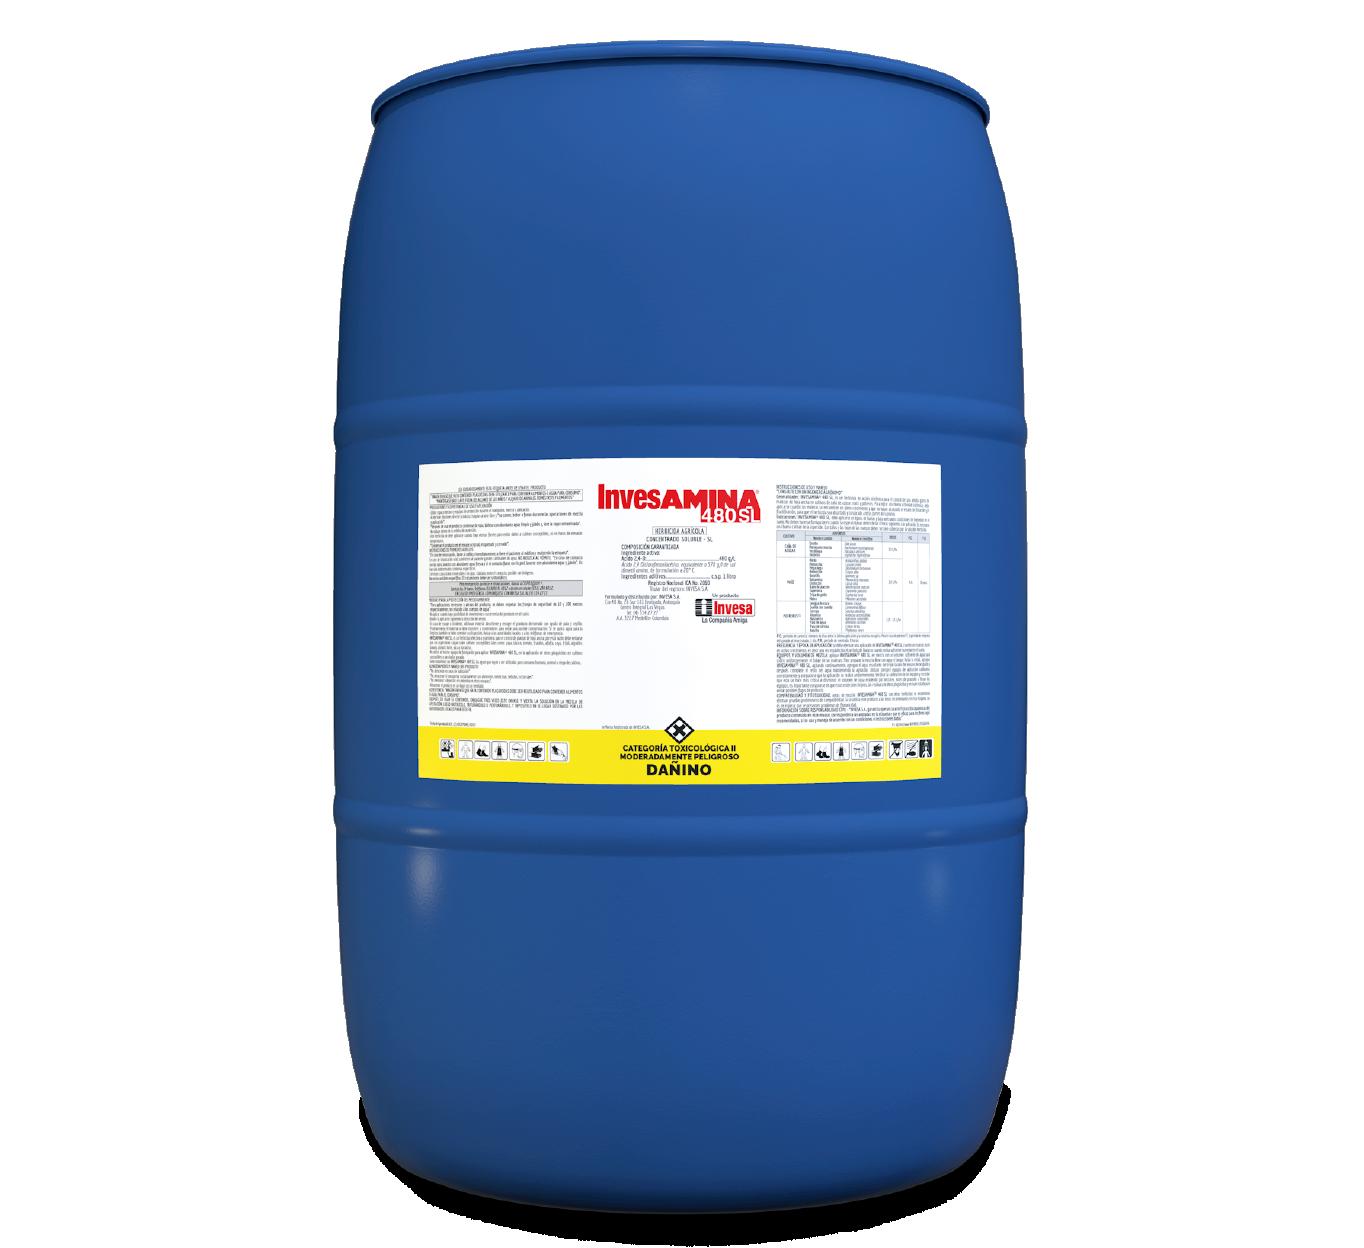 Herbicida invesamina 480 invesa 200 litros